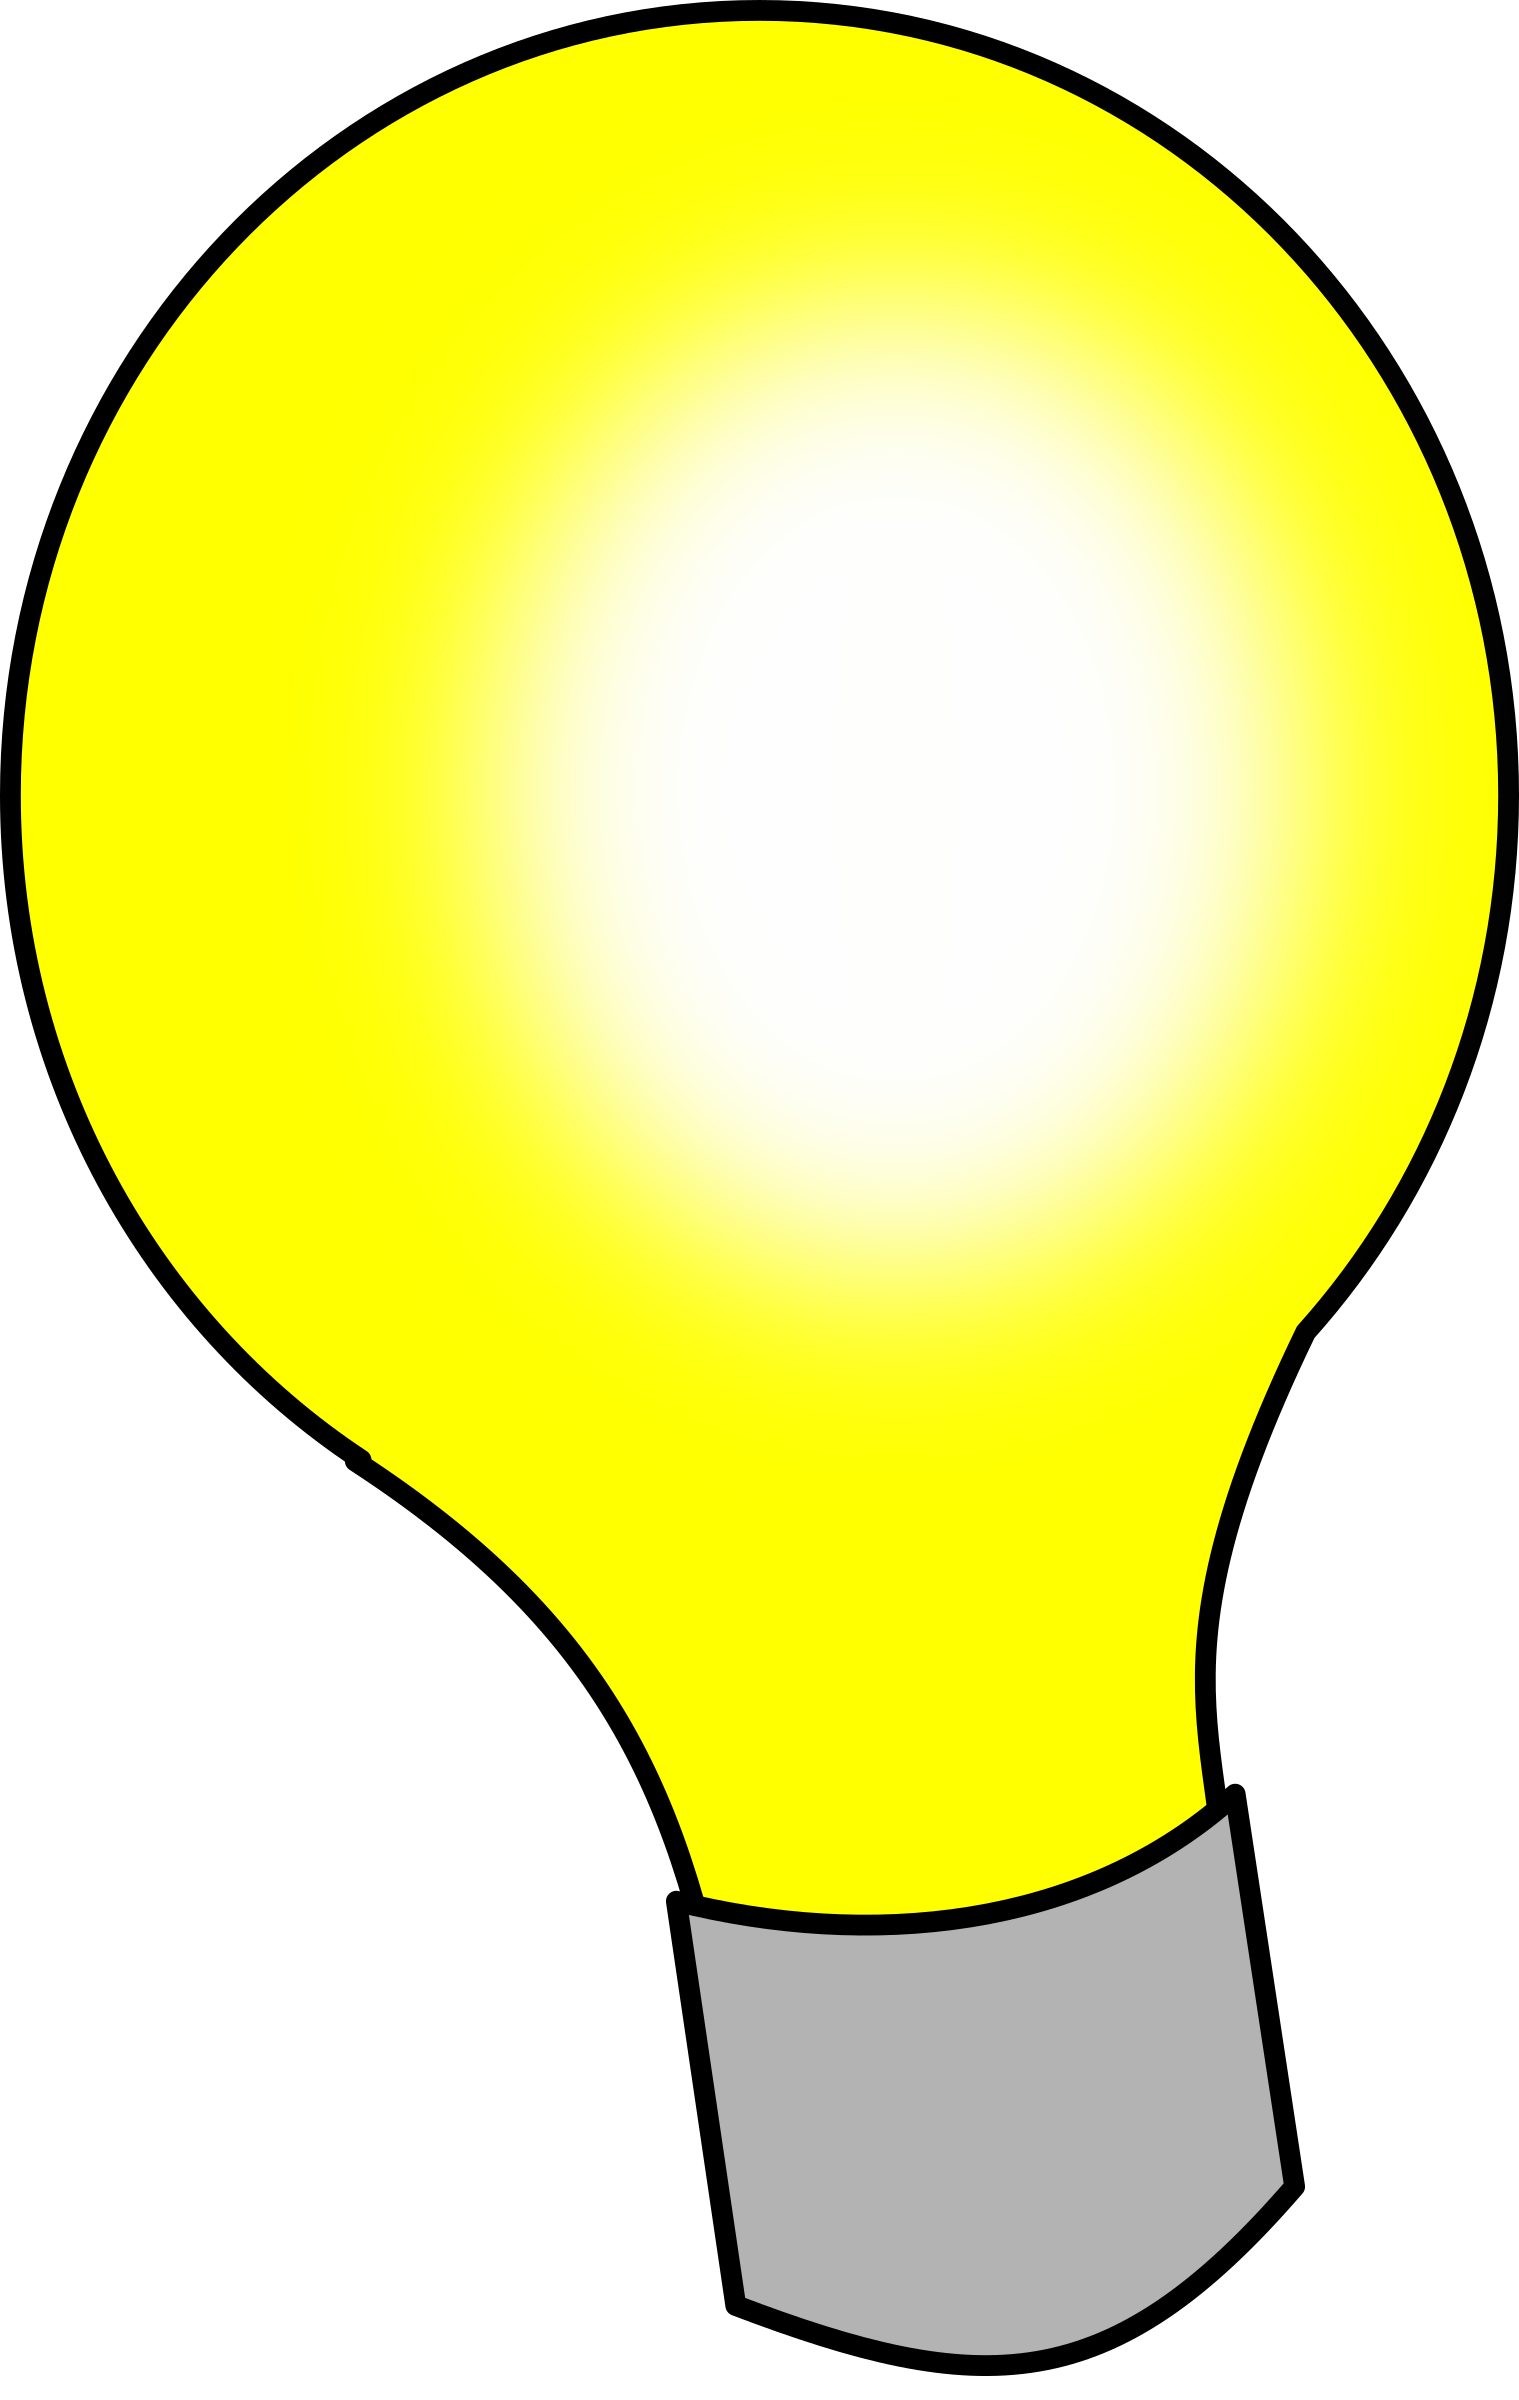 vector freeuse Bulb clipart electric bulb. Light big image png